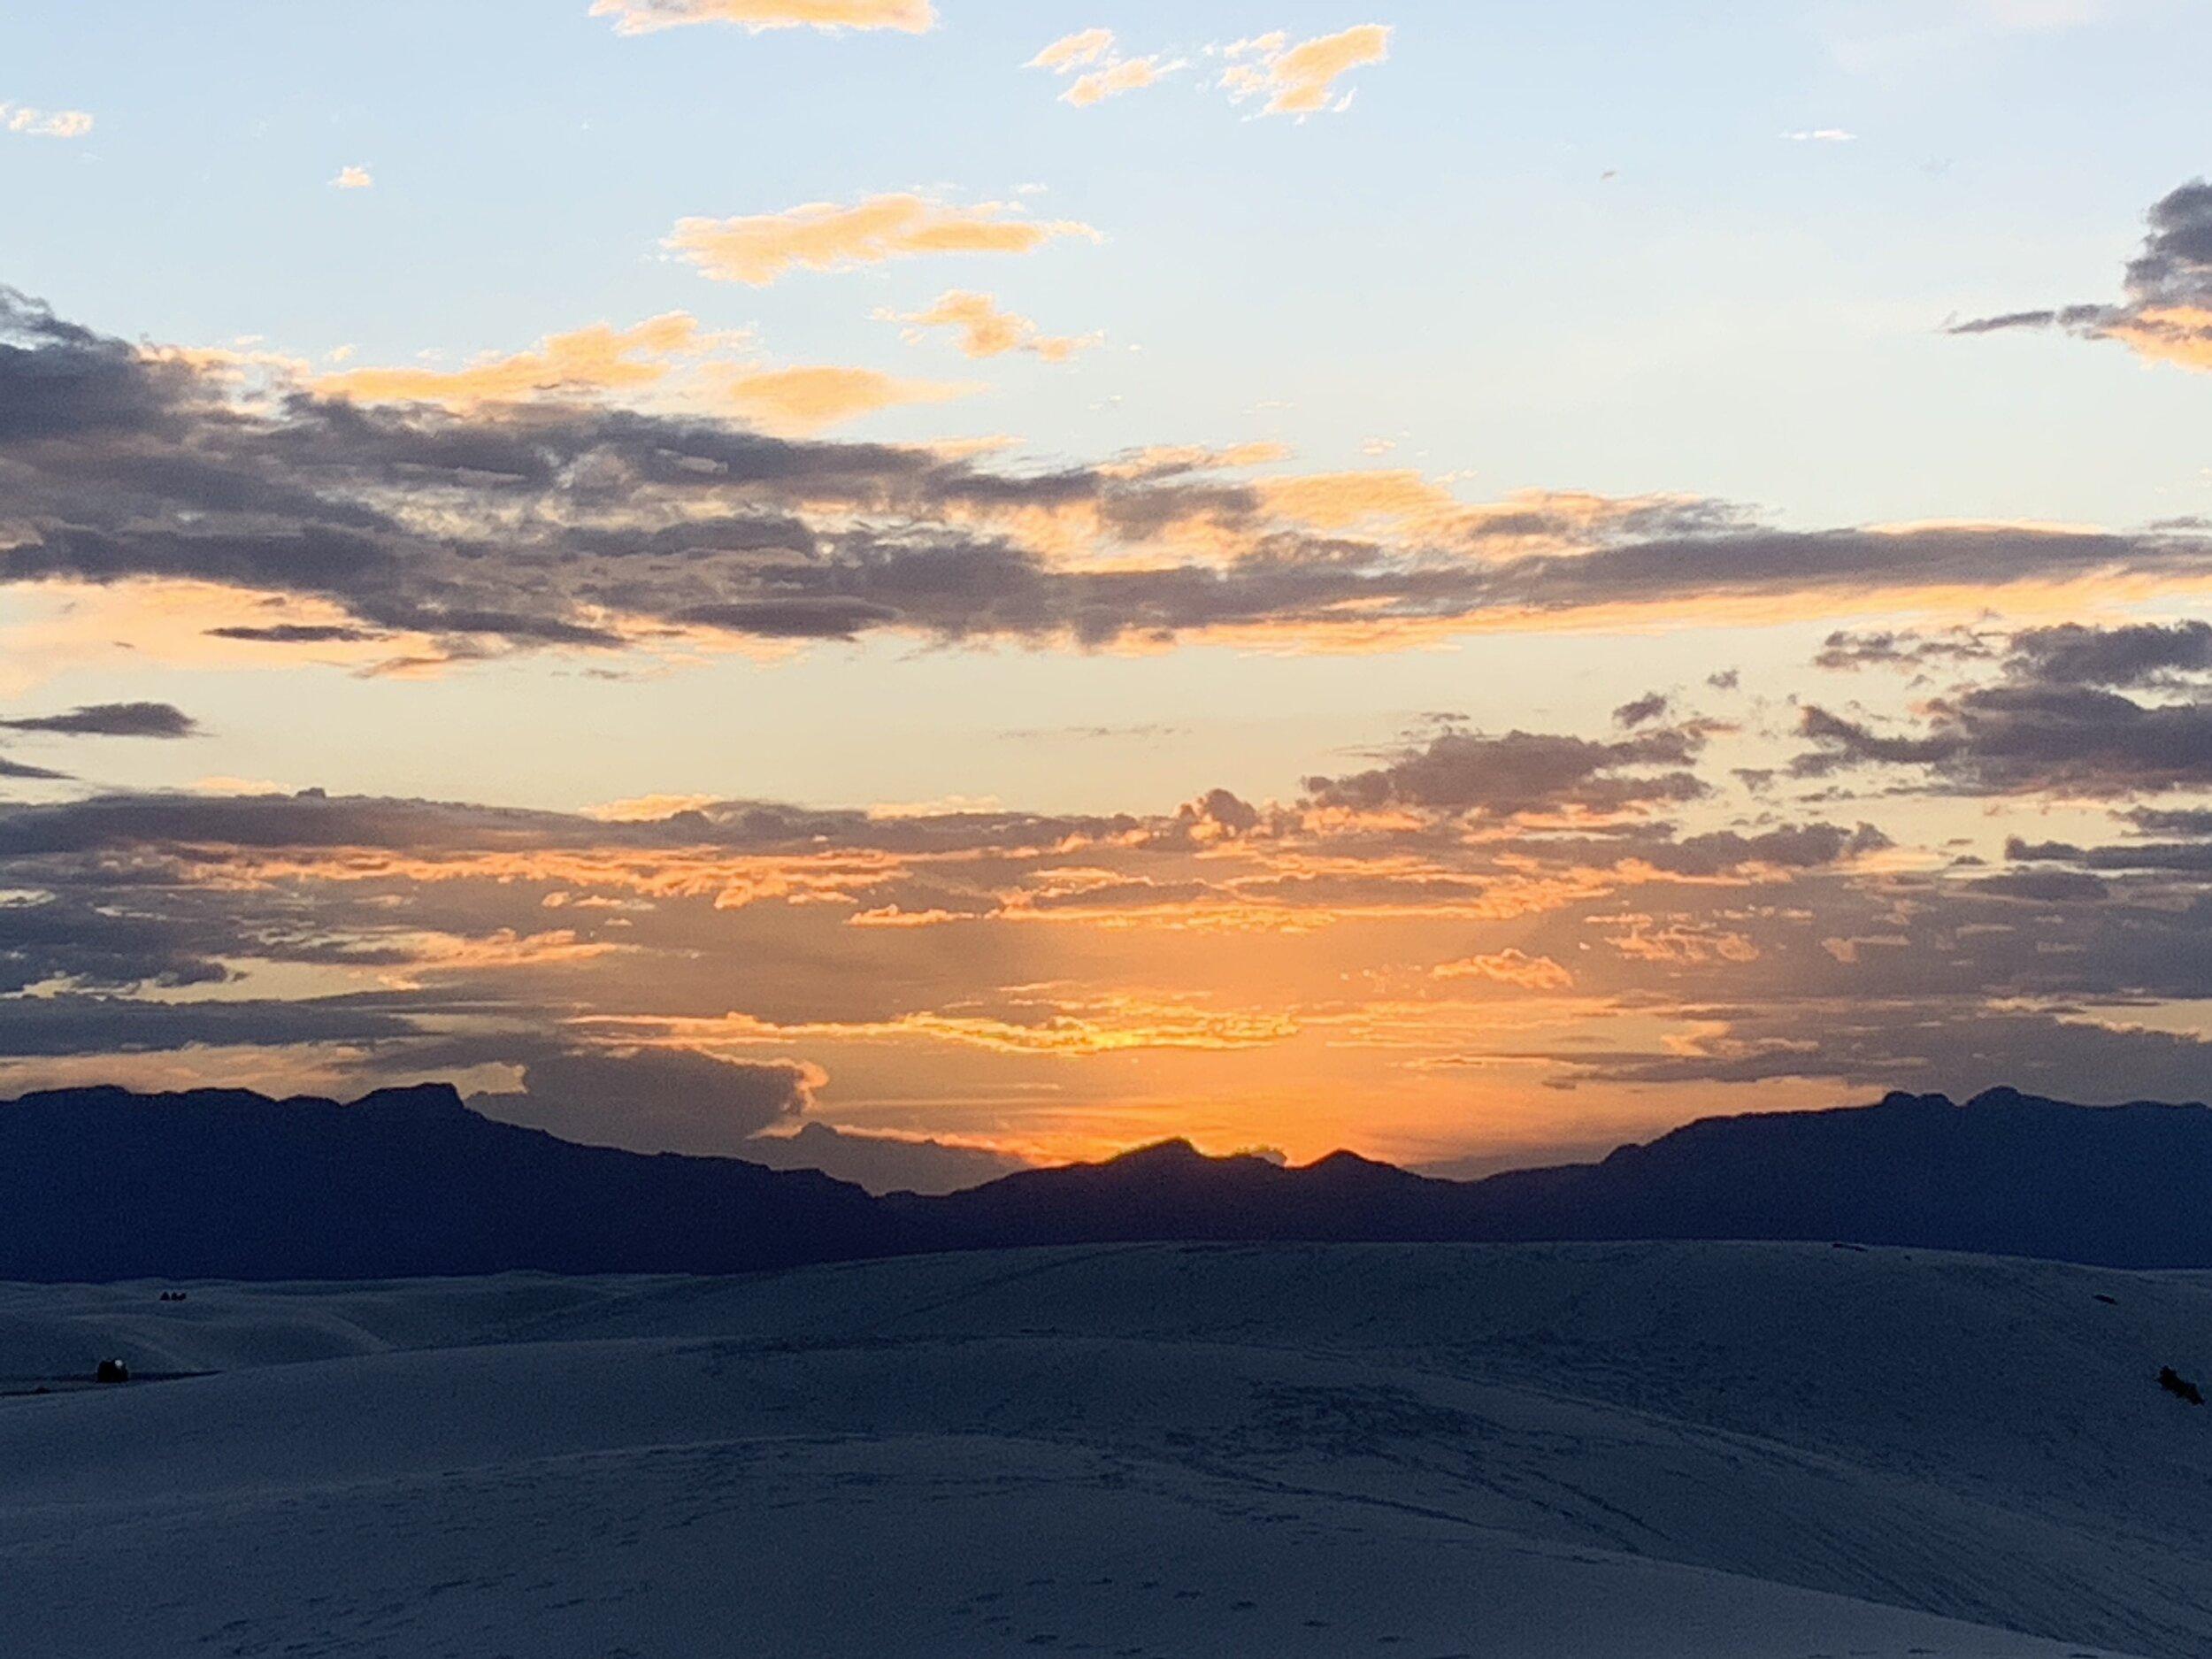 White Sands National Monument at Sunset.